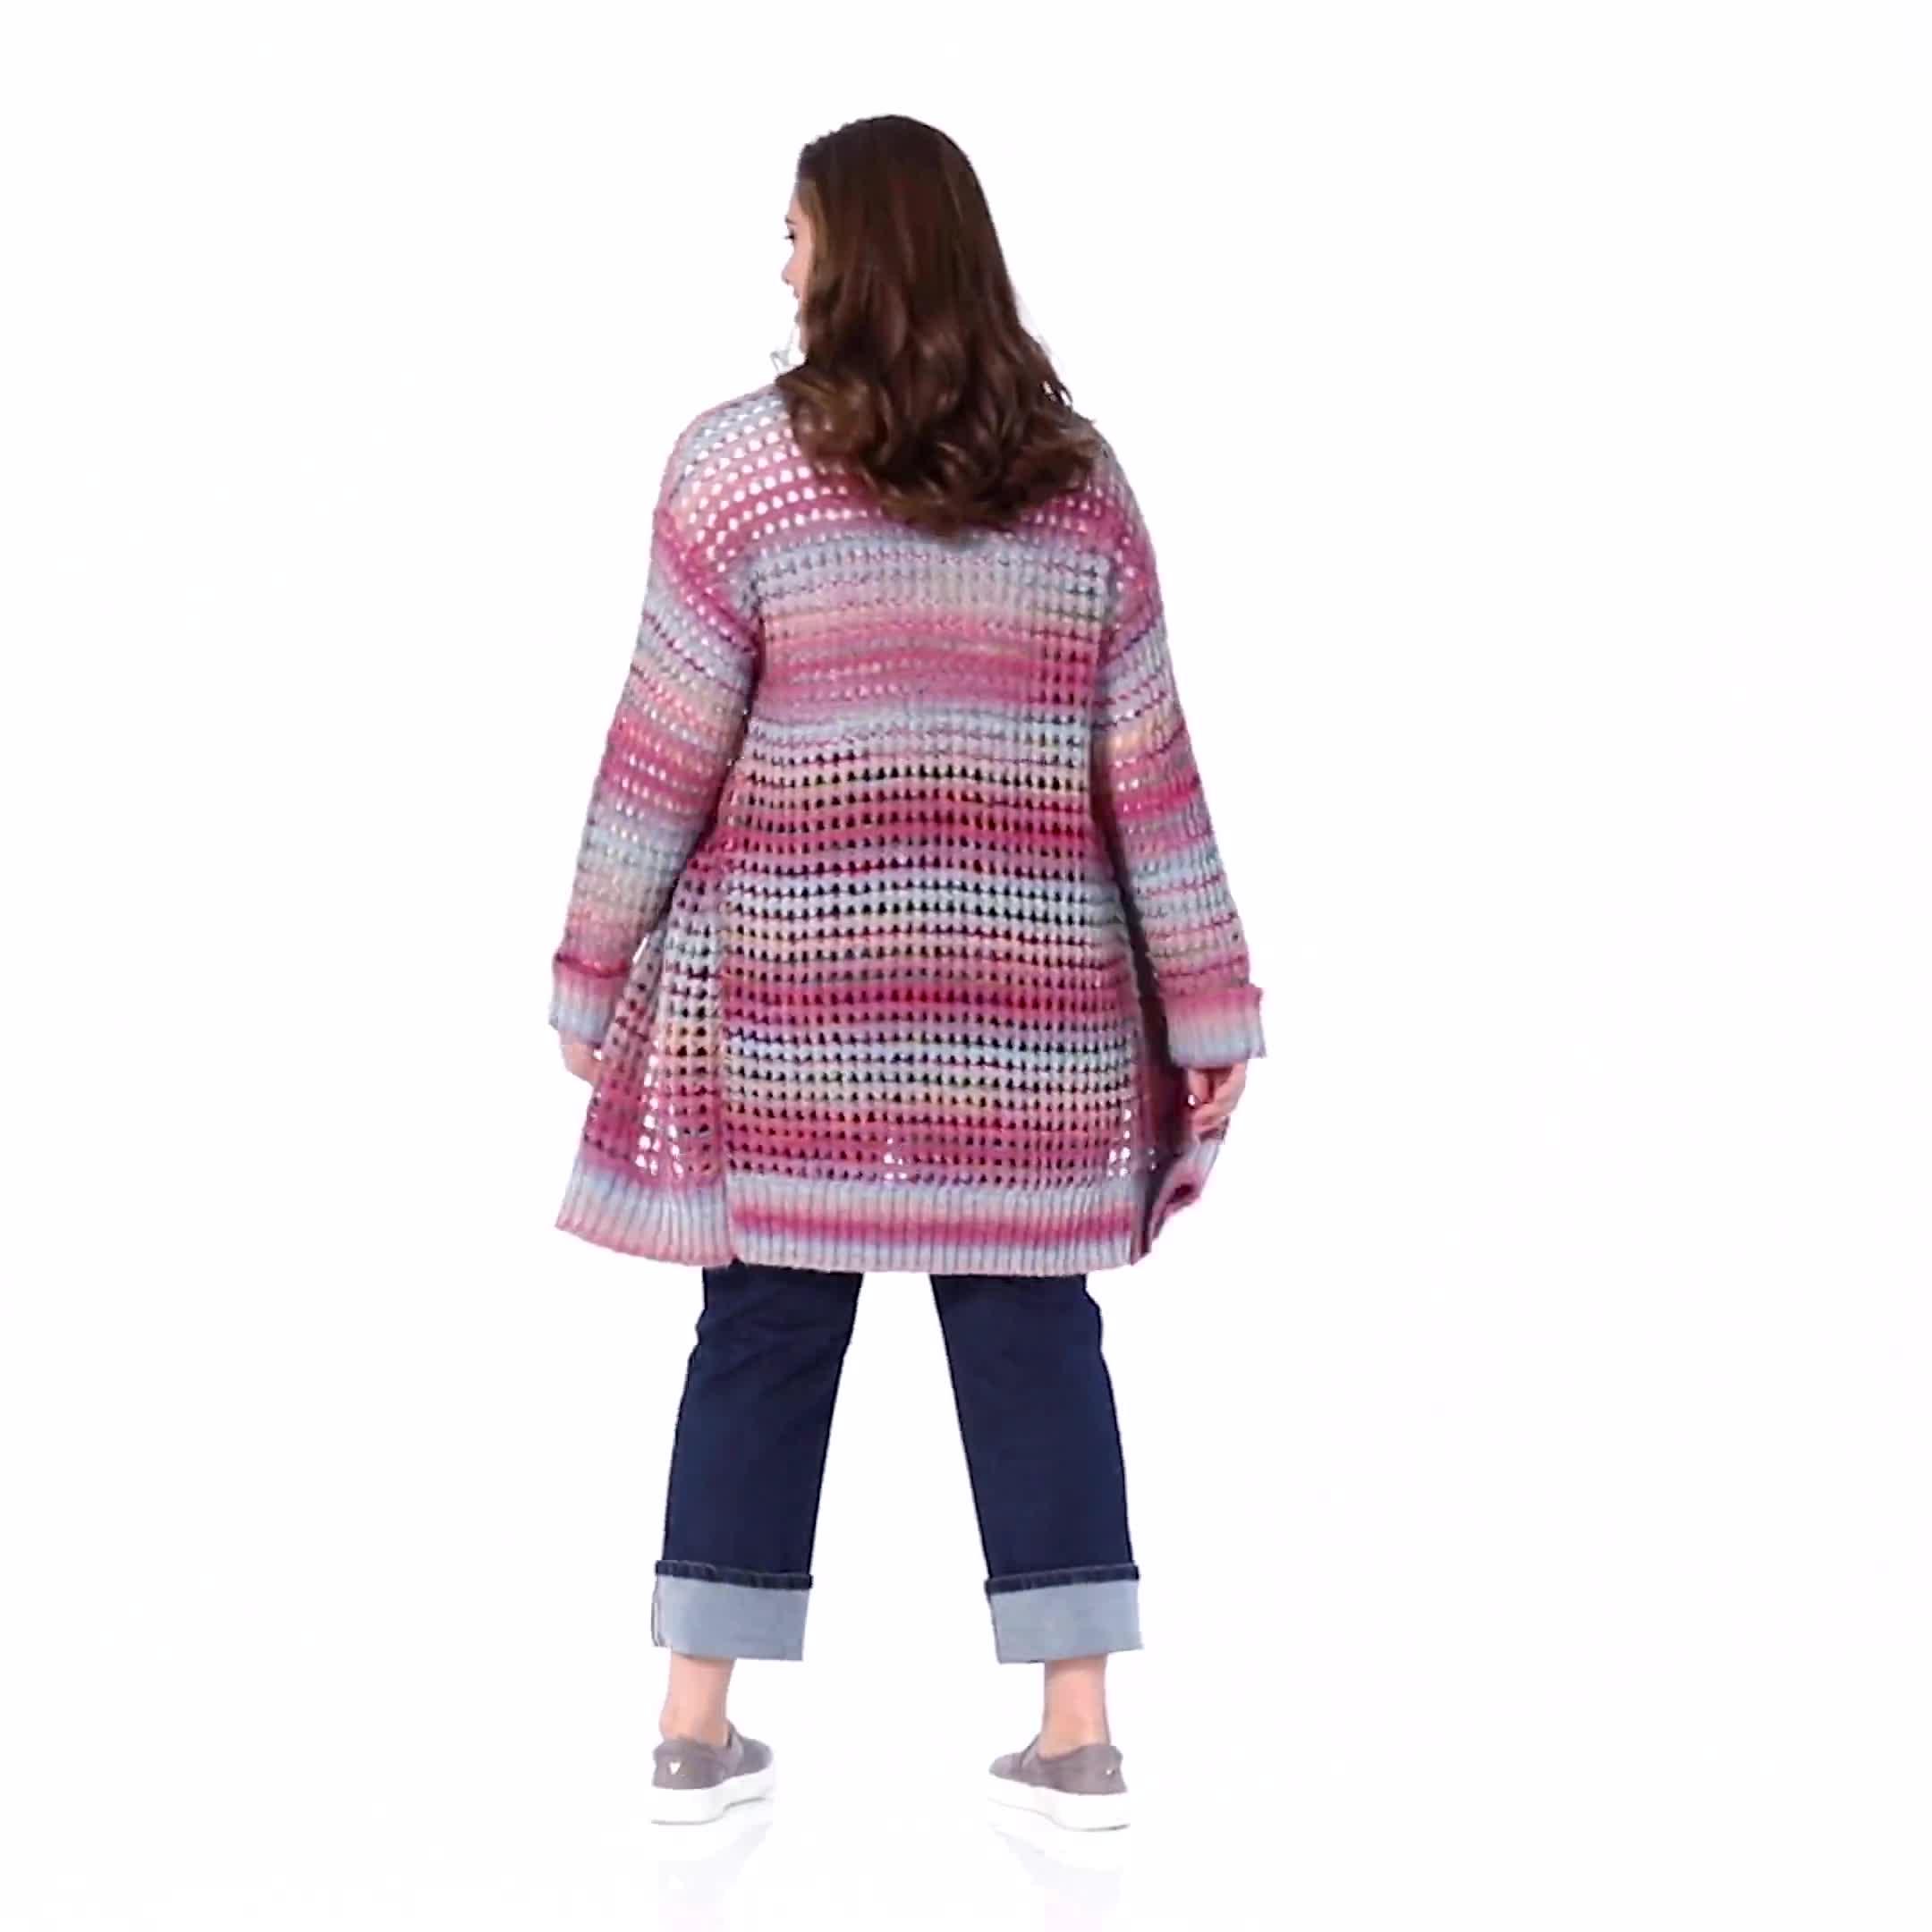 Westport Multi-Color Duster Cardigan  - Plus - Video